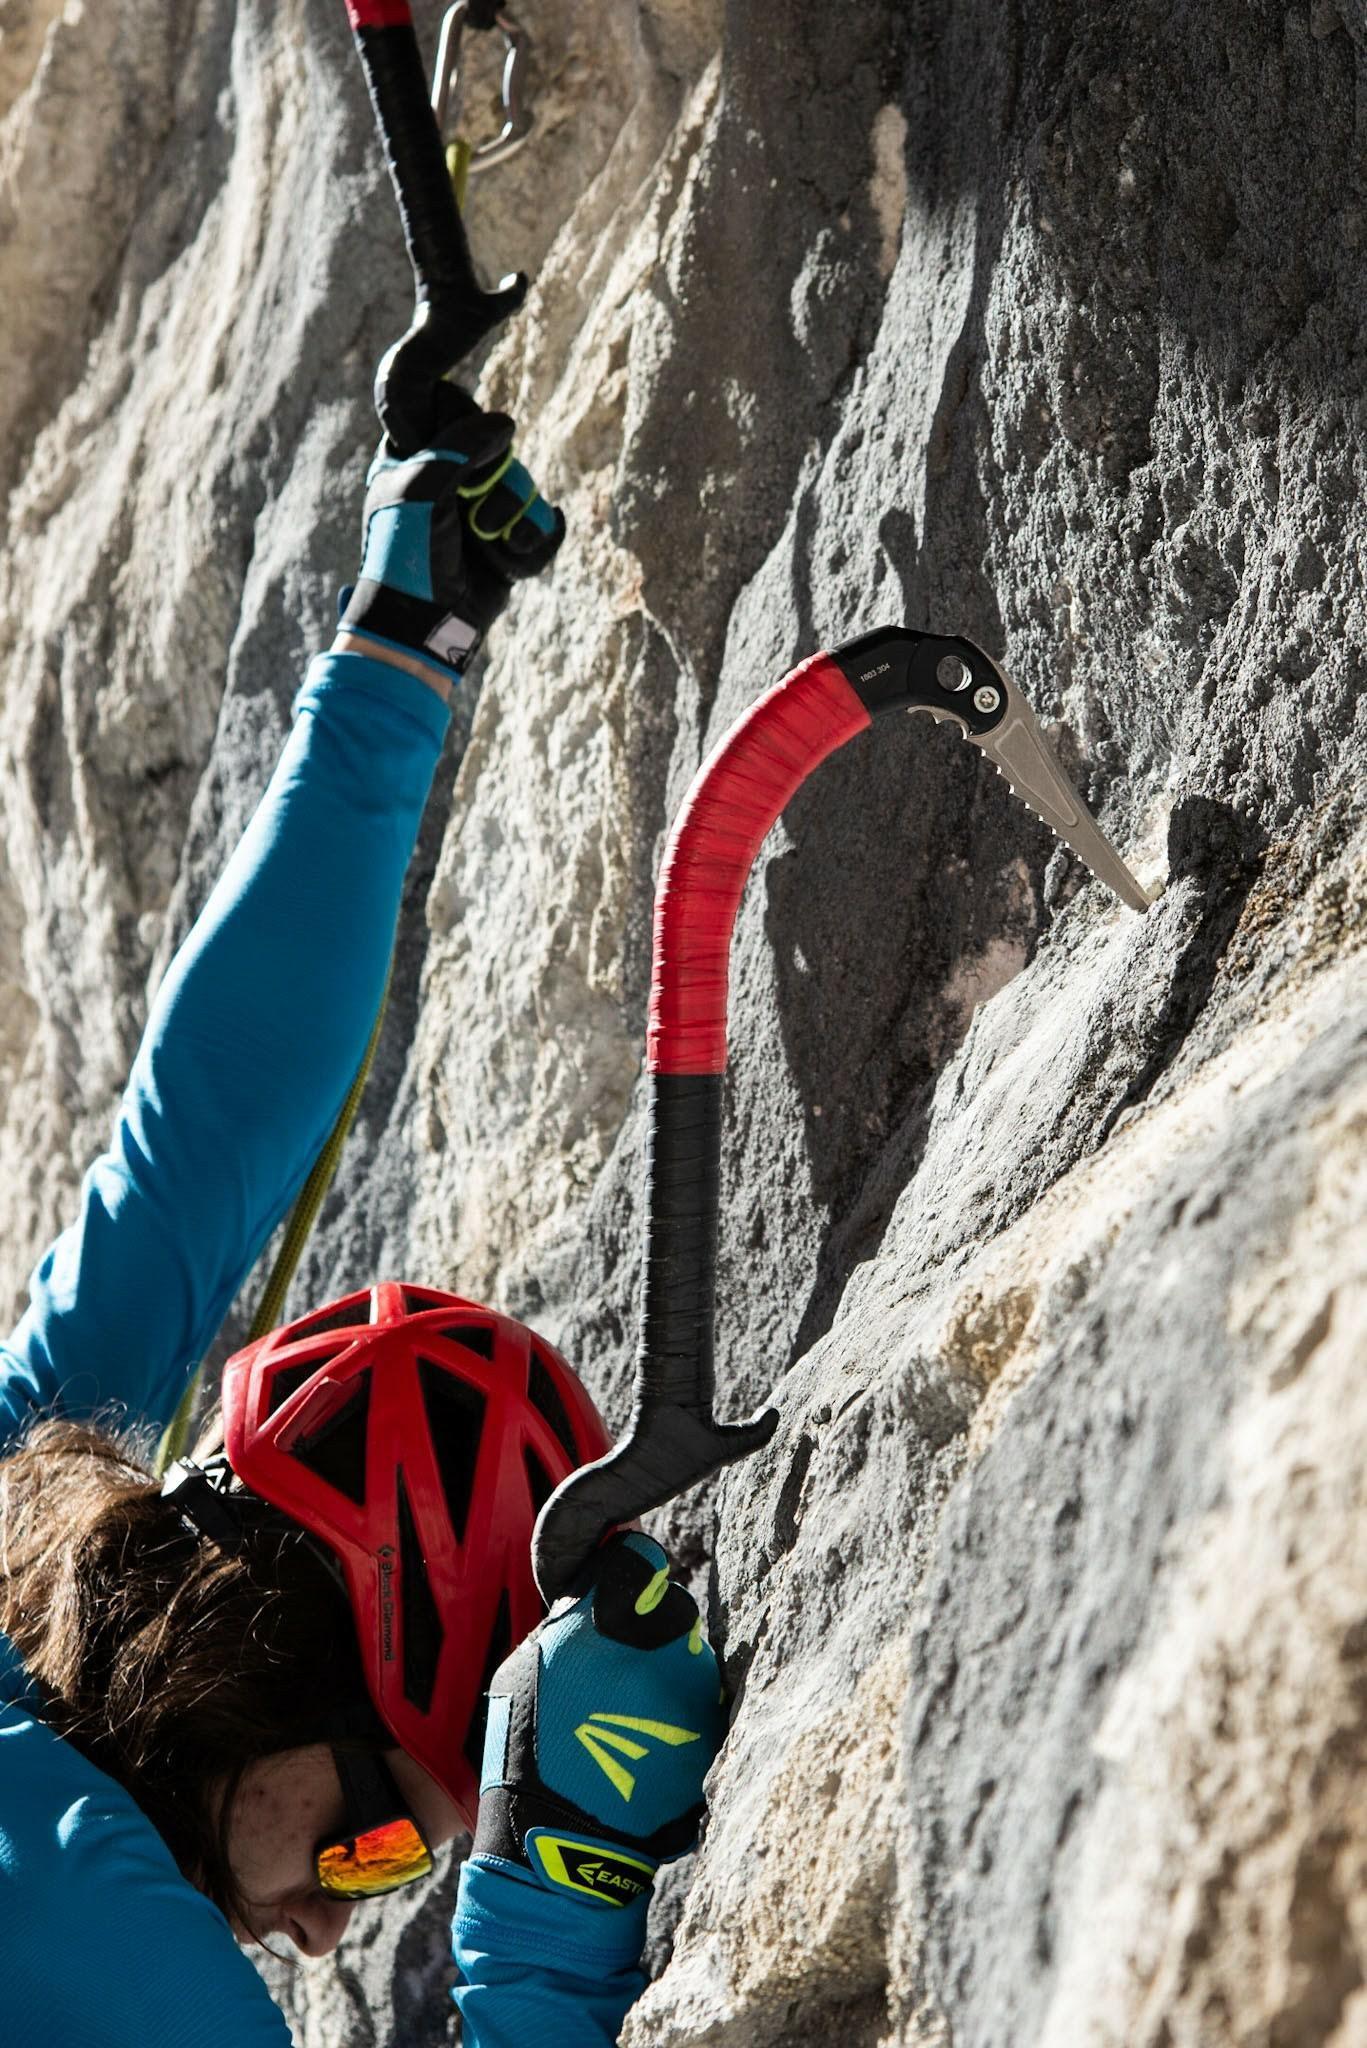 Ice Rock Aspeed climbing on rock